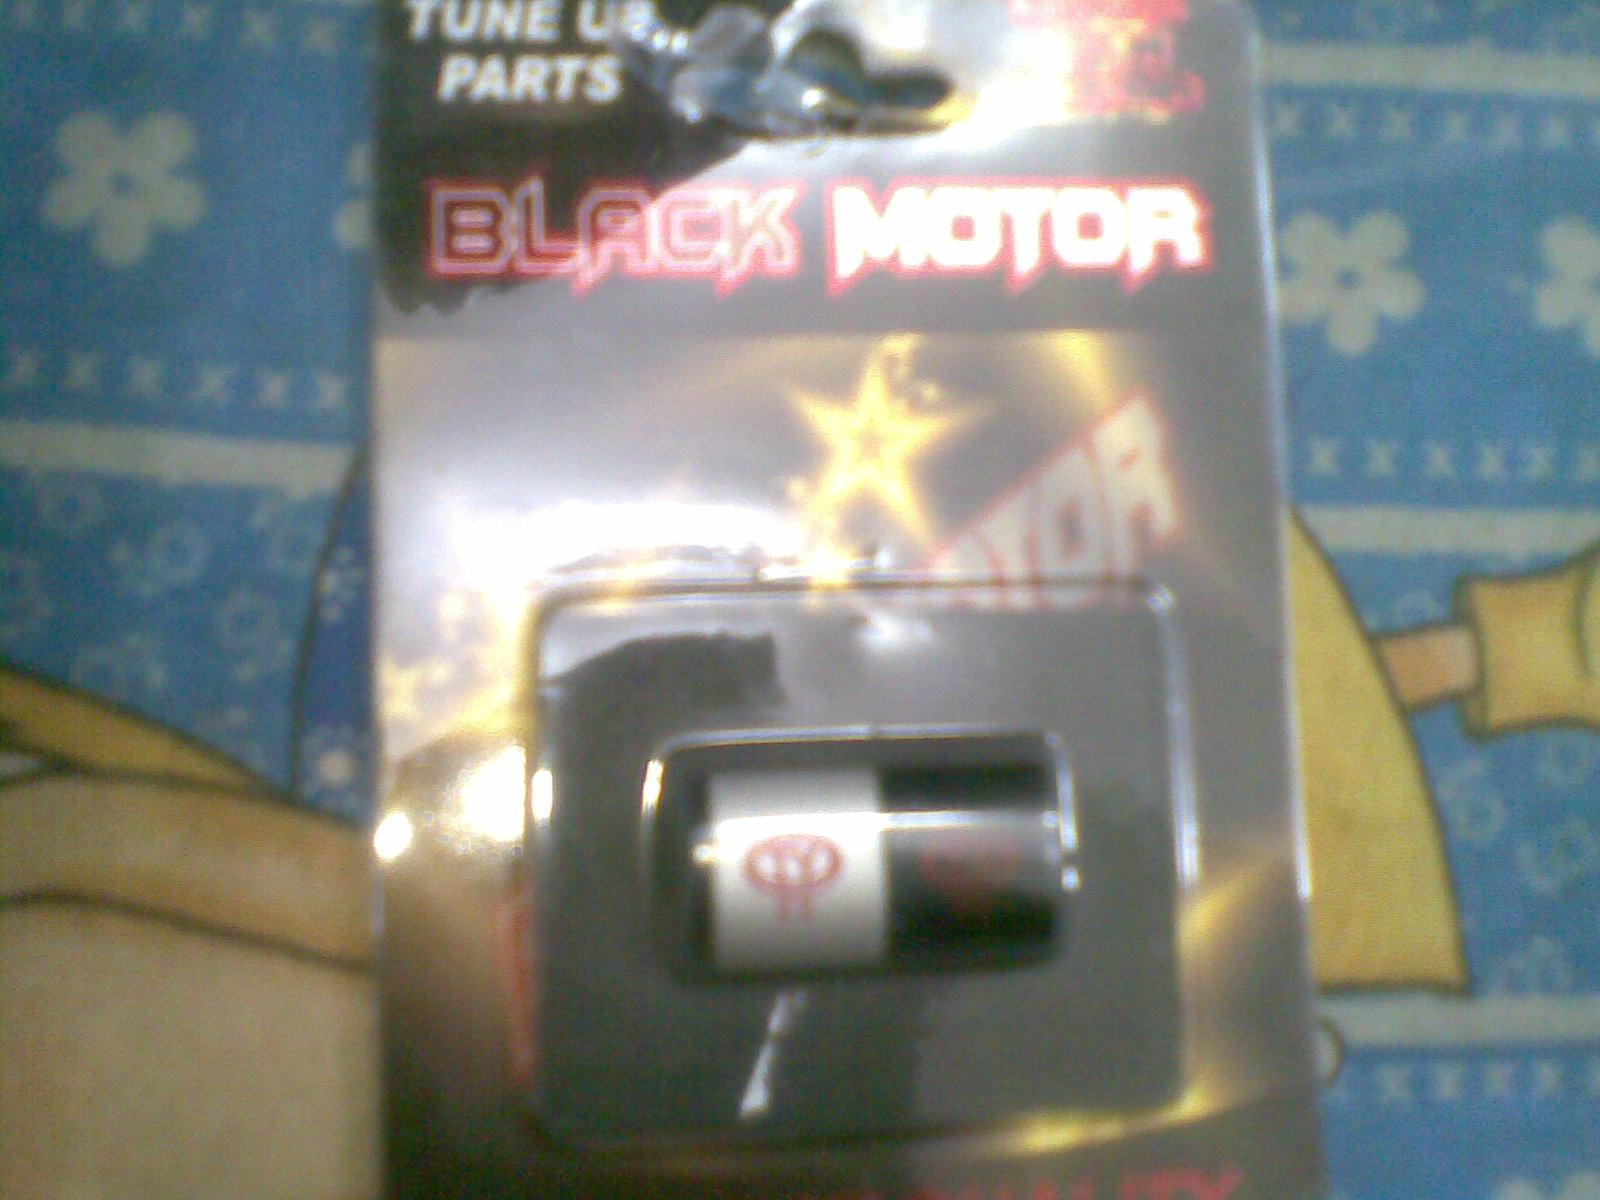 Jual Spare Parts Tamiya Online Bekasi Magnet Strong Dinamo Sloop Black Motor 22 X 12 Rp 45000